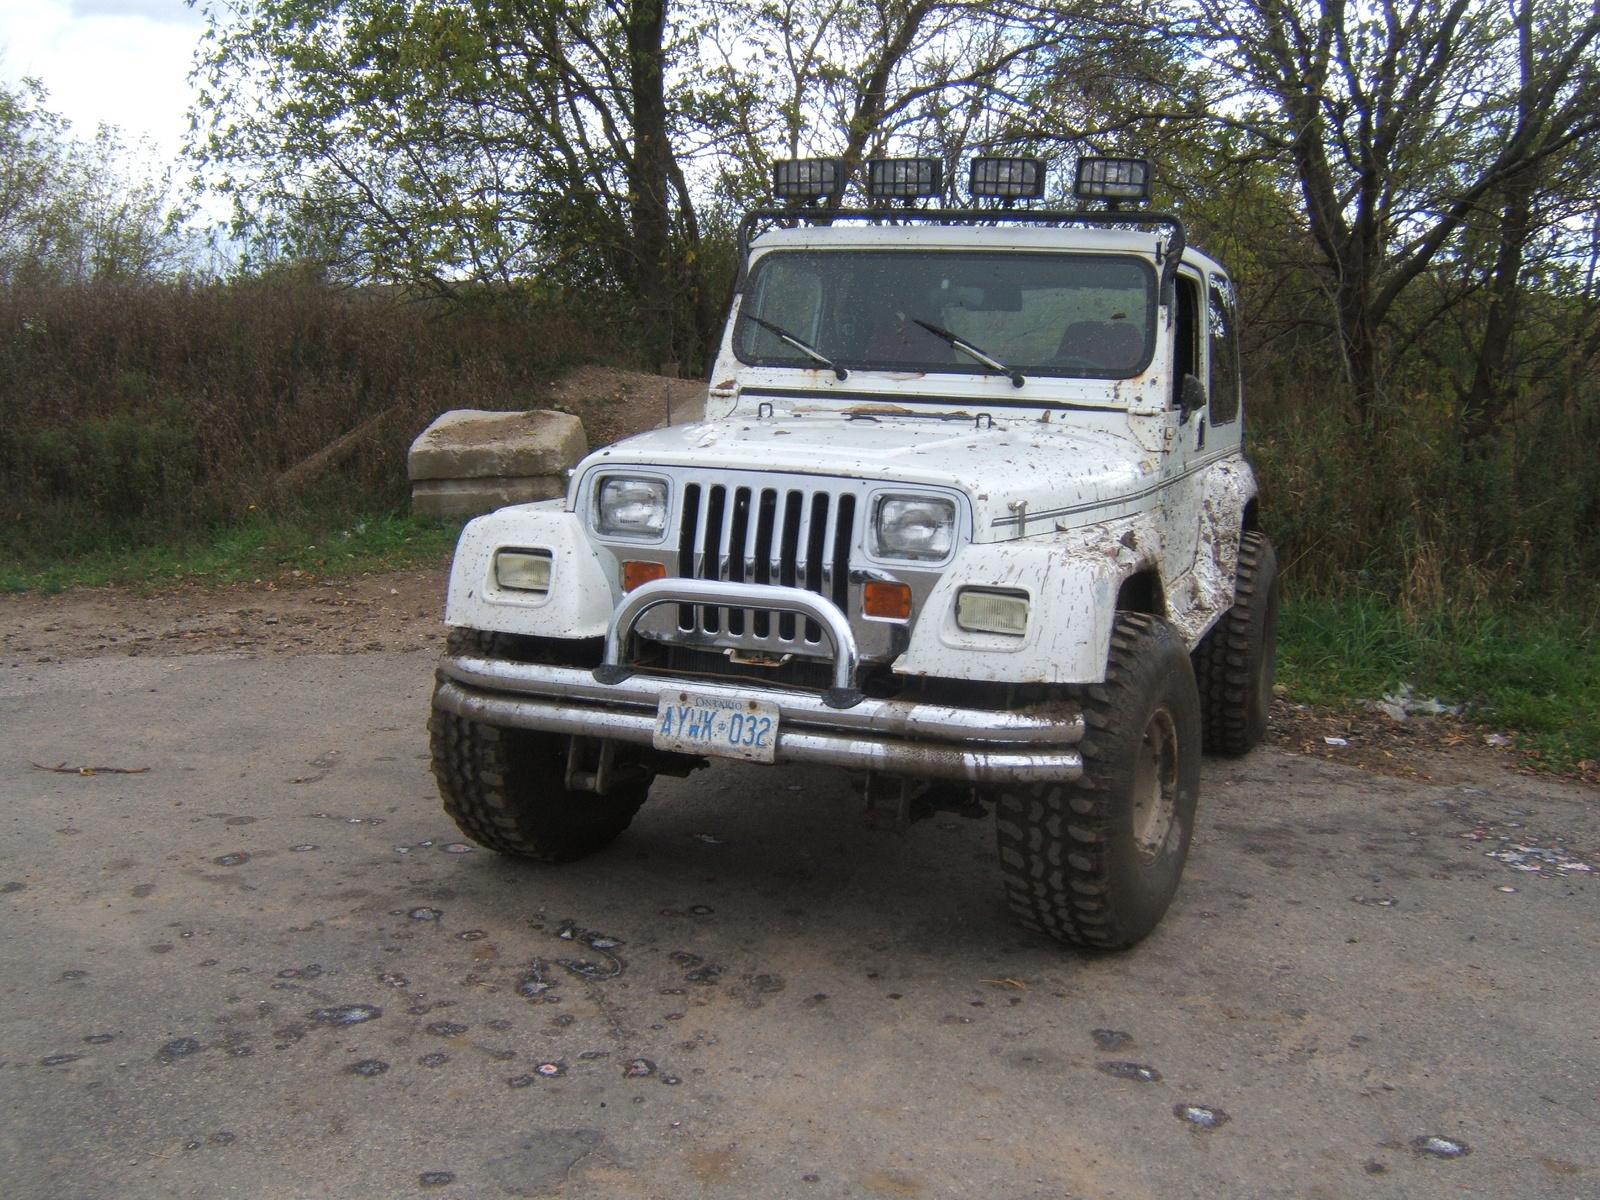 fender replacement. - jeepforum